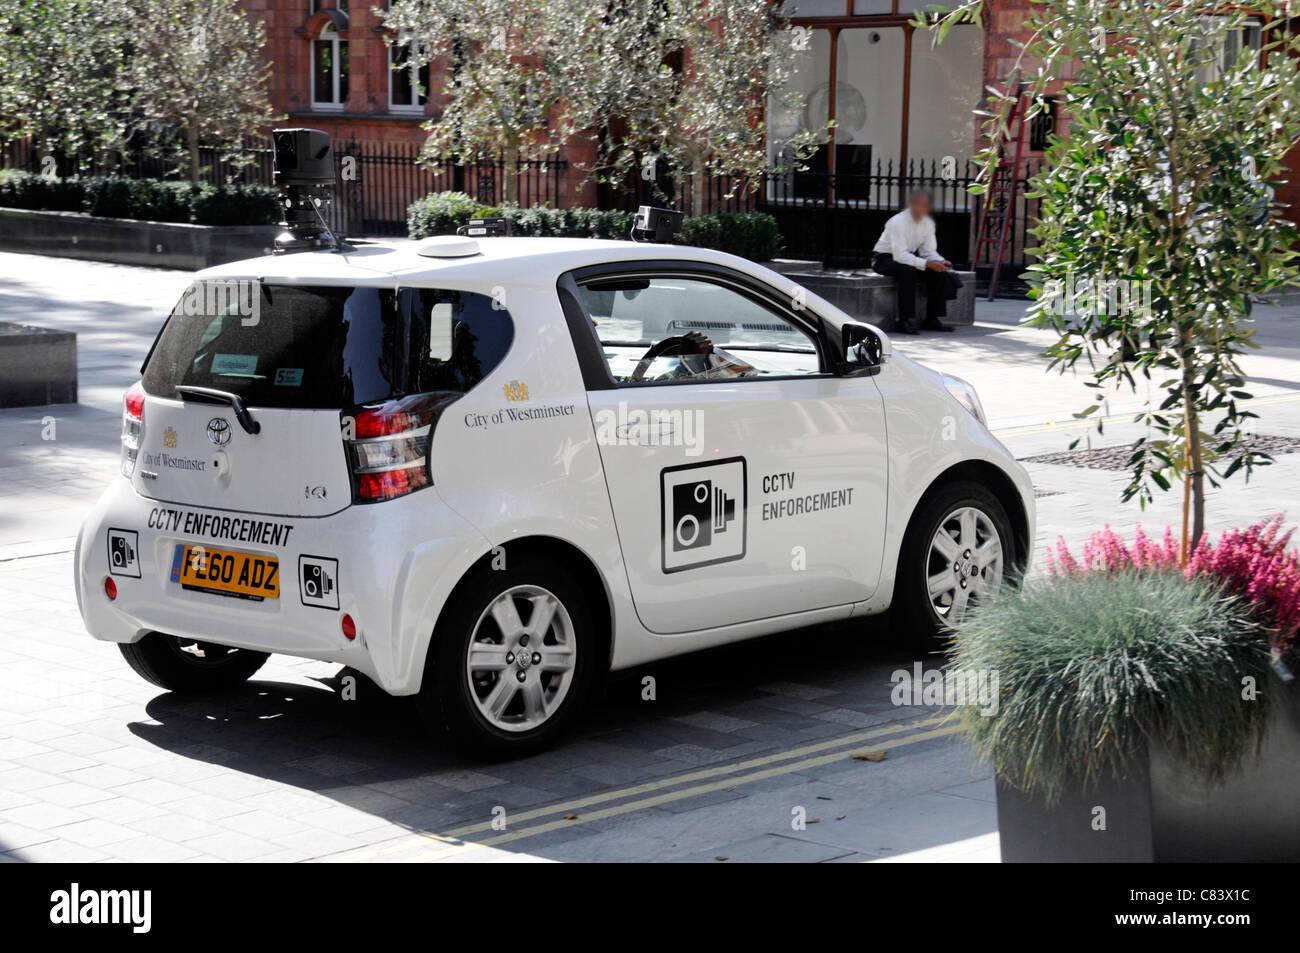 City of Westminster CCTV enforcement car patrolling in Mayfair - Stock Image